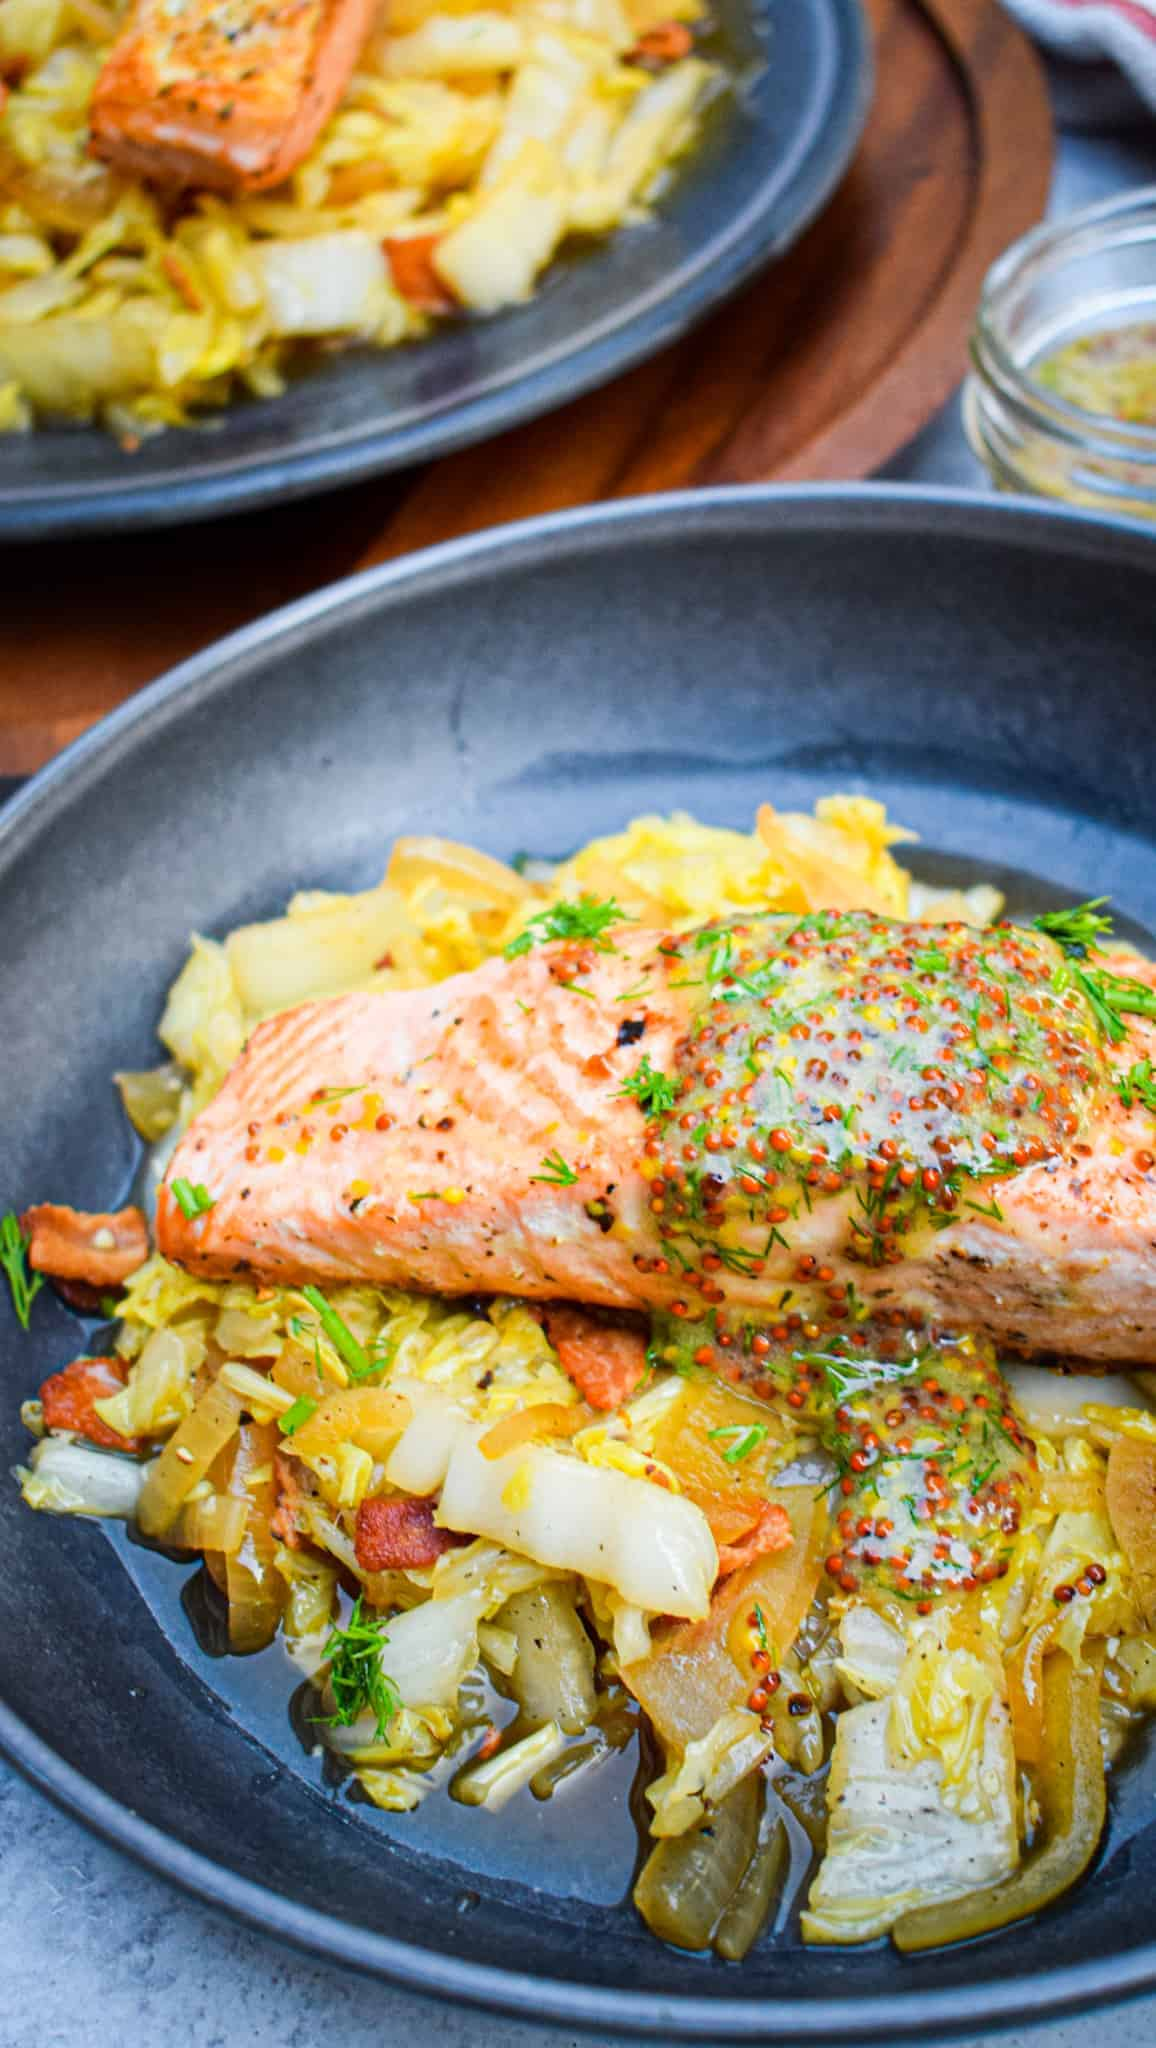 seared salmon with wholegrain mustard sauce